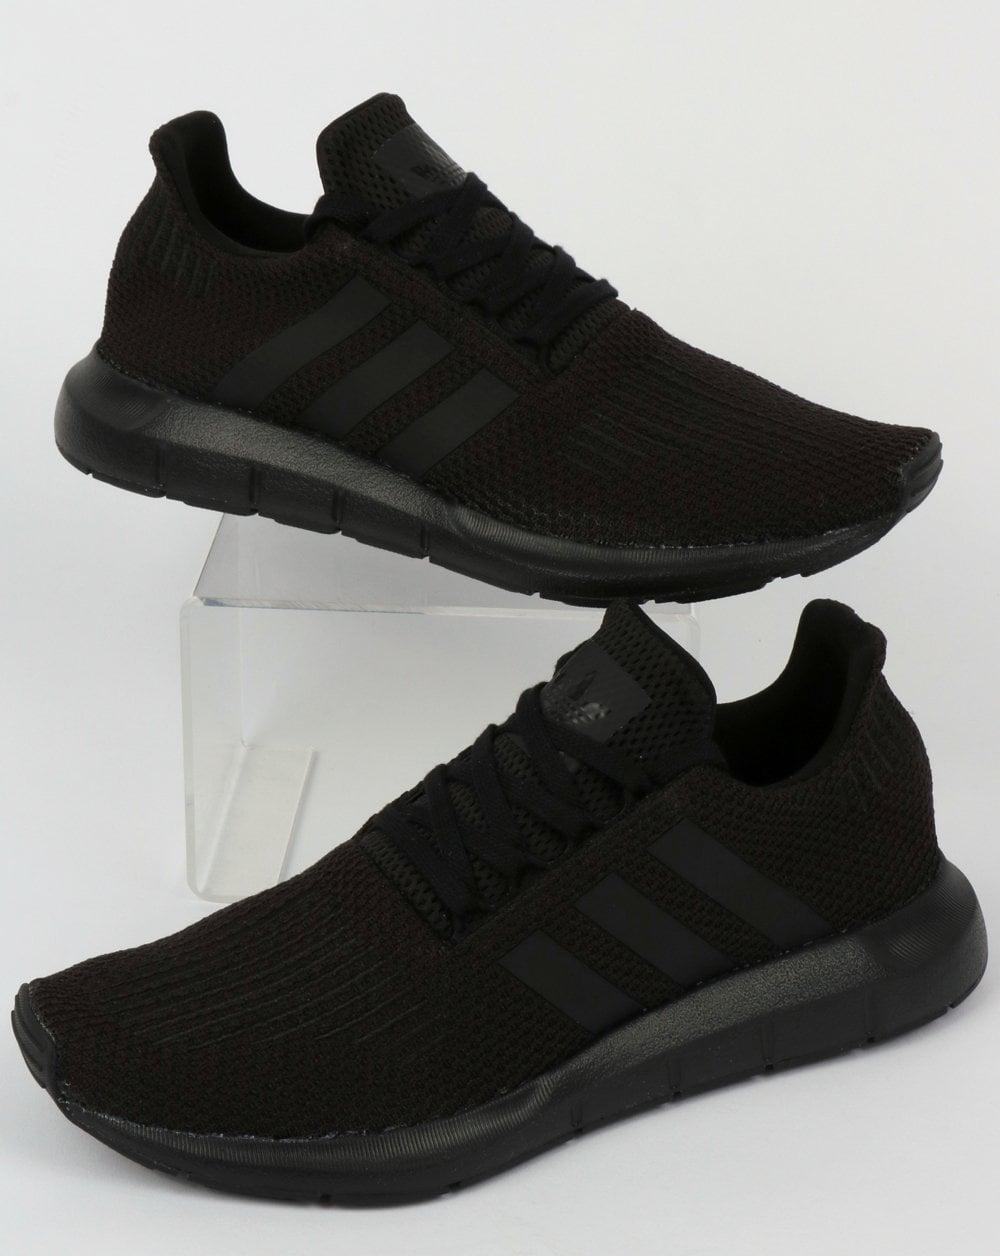 8768070a1d70c1 adidas Trainers Adidas Swift Run Trainers Triple Black